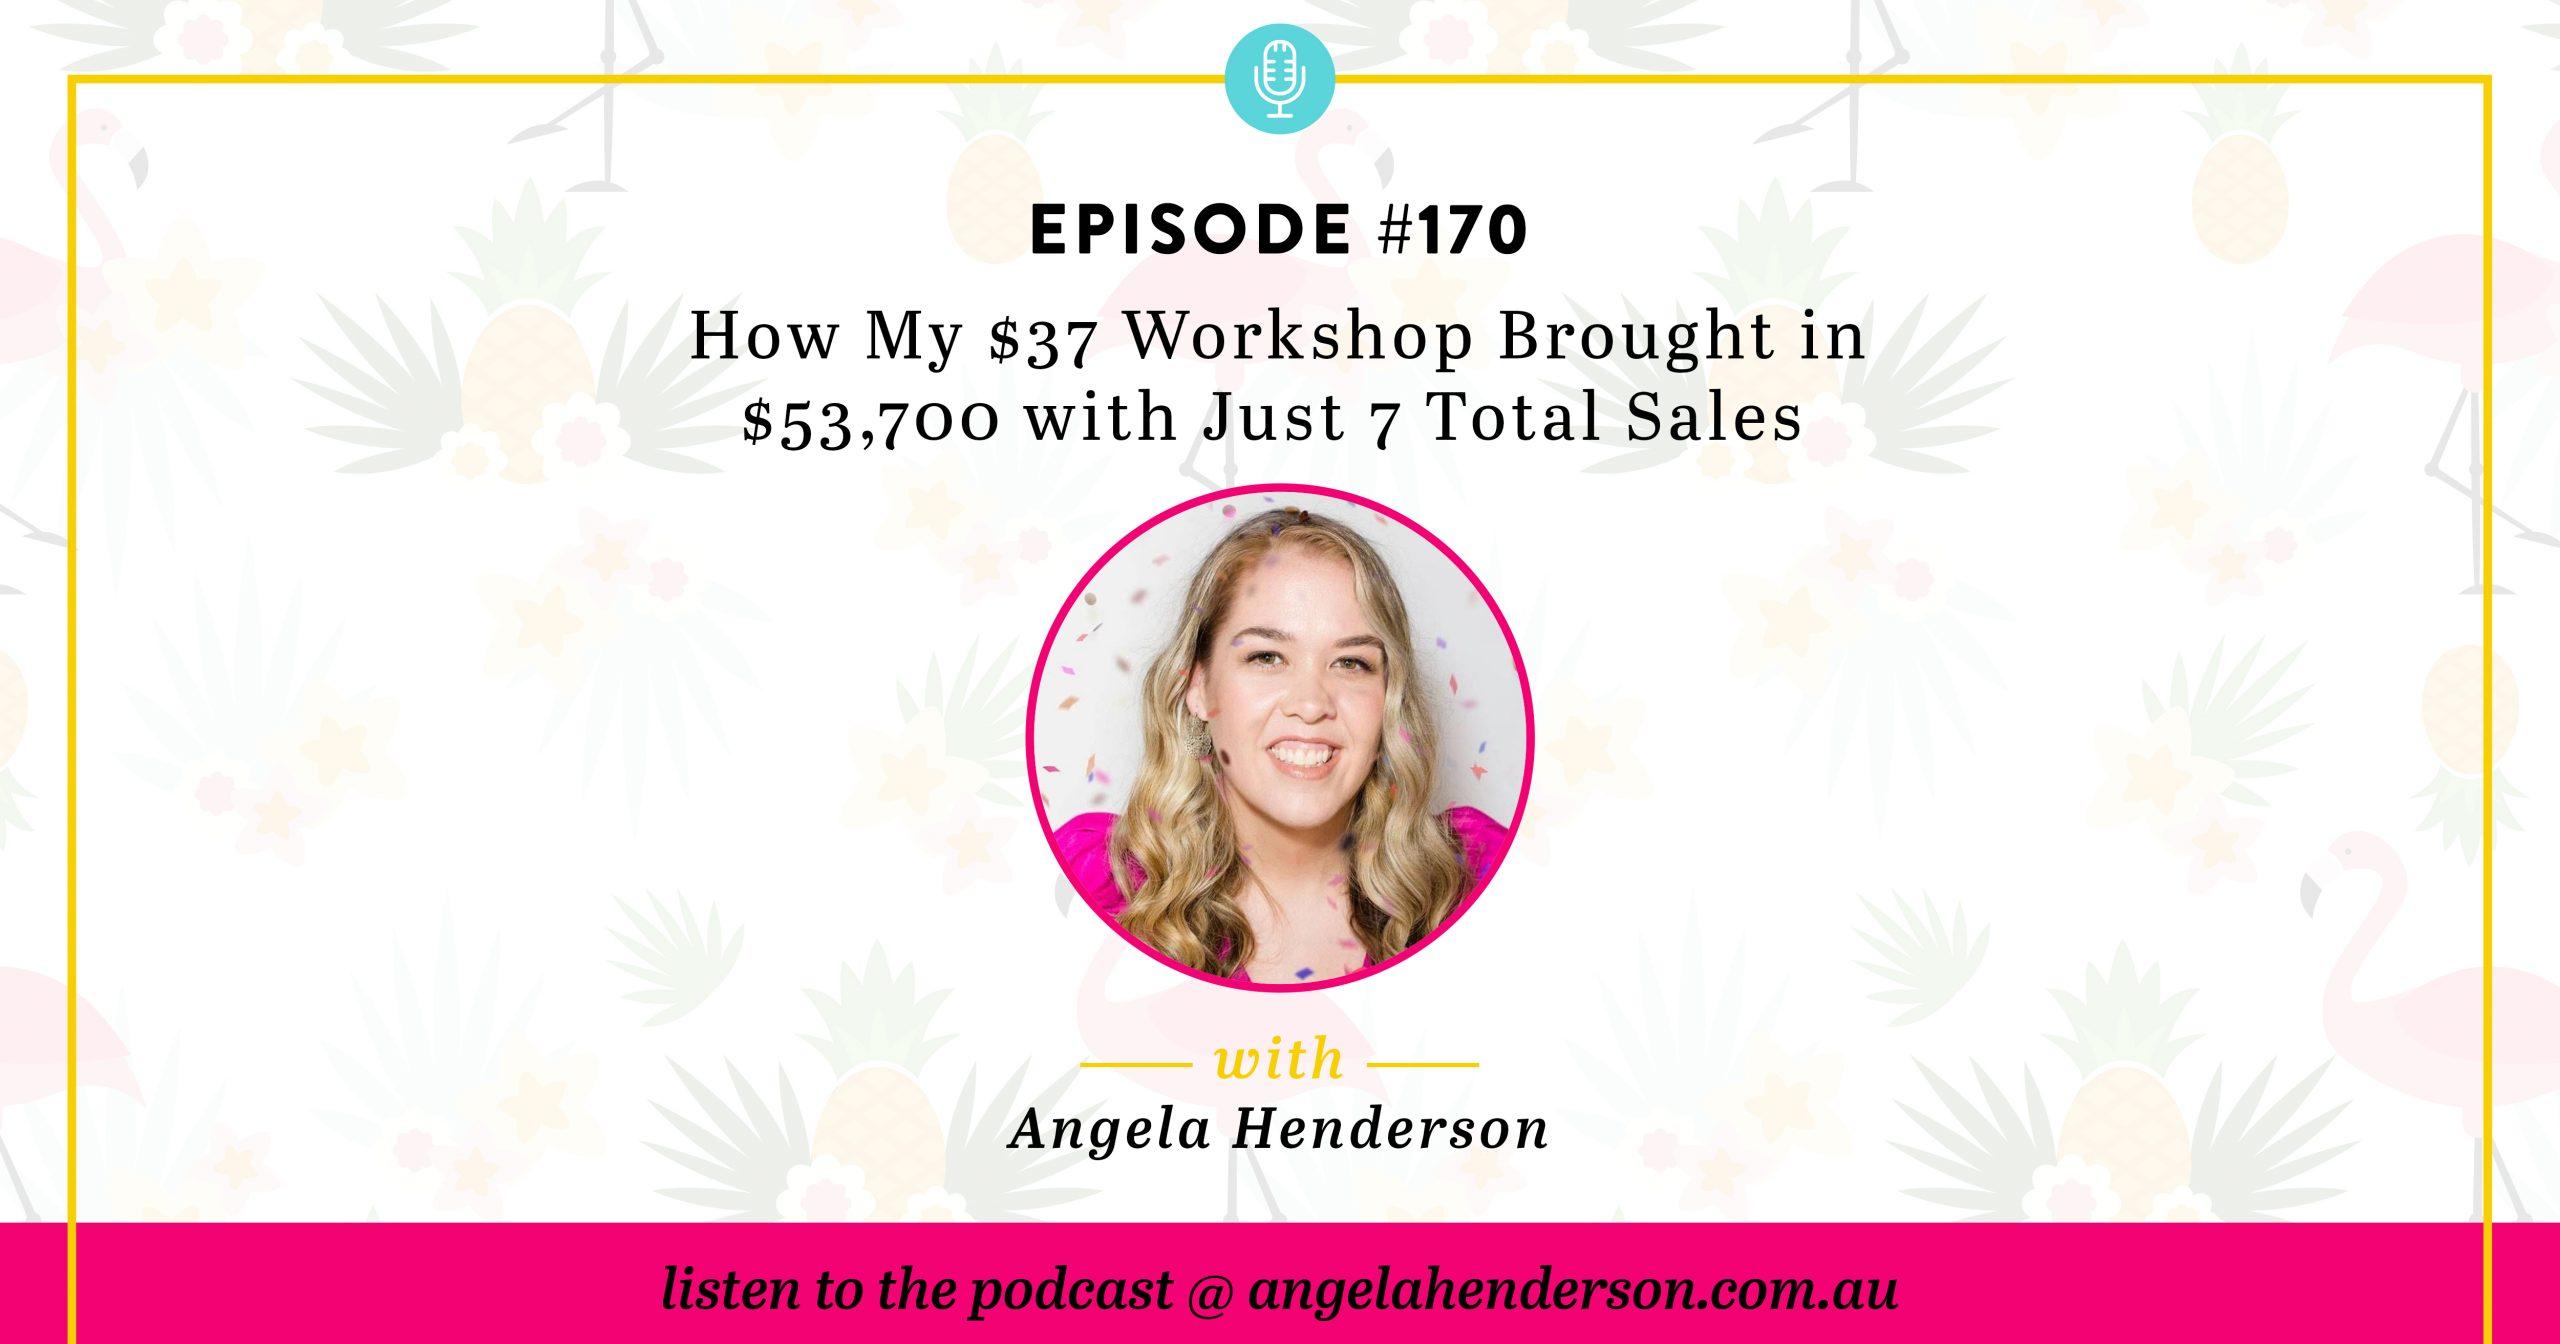 Angela Henderson